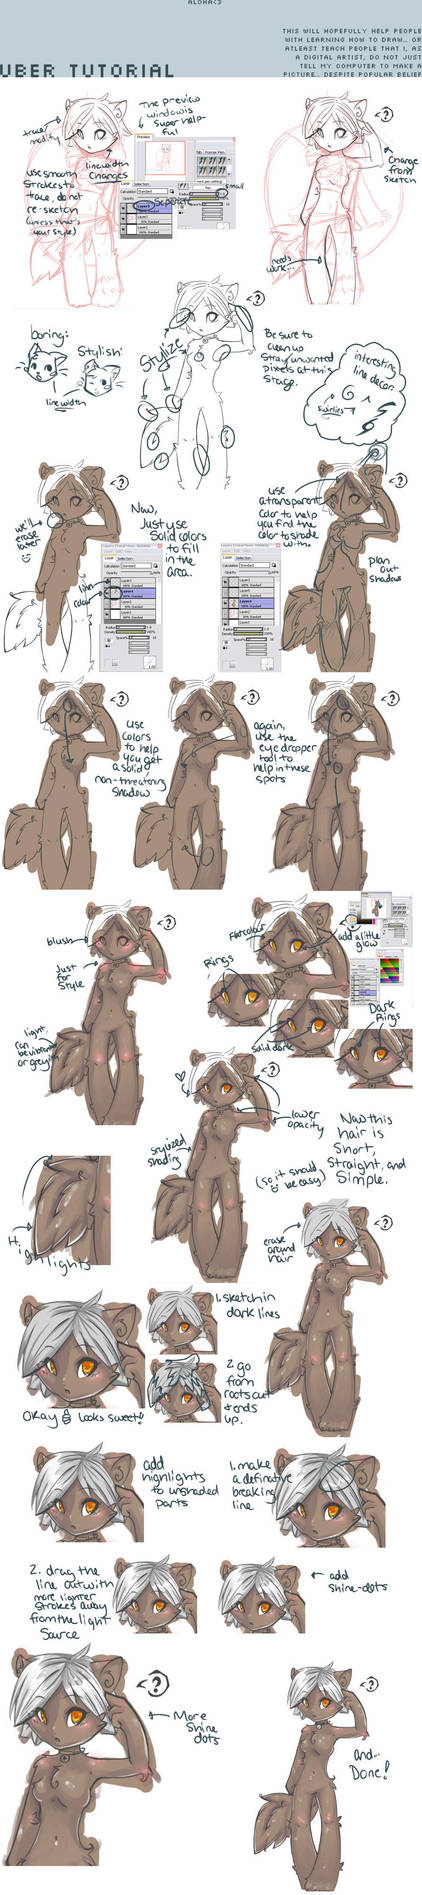 :Complete CG Guide: by ooaloha46oo